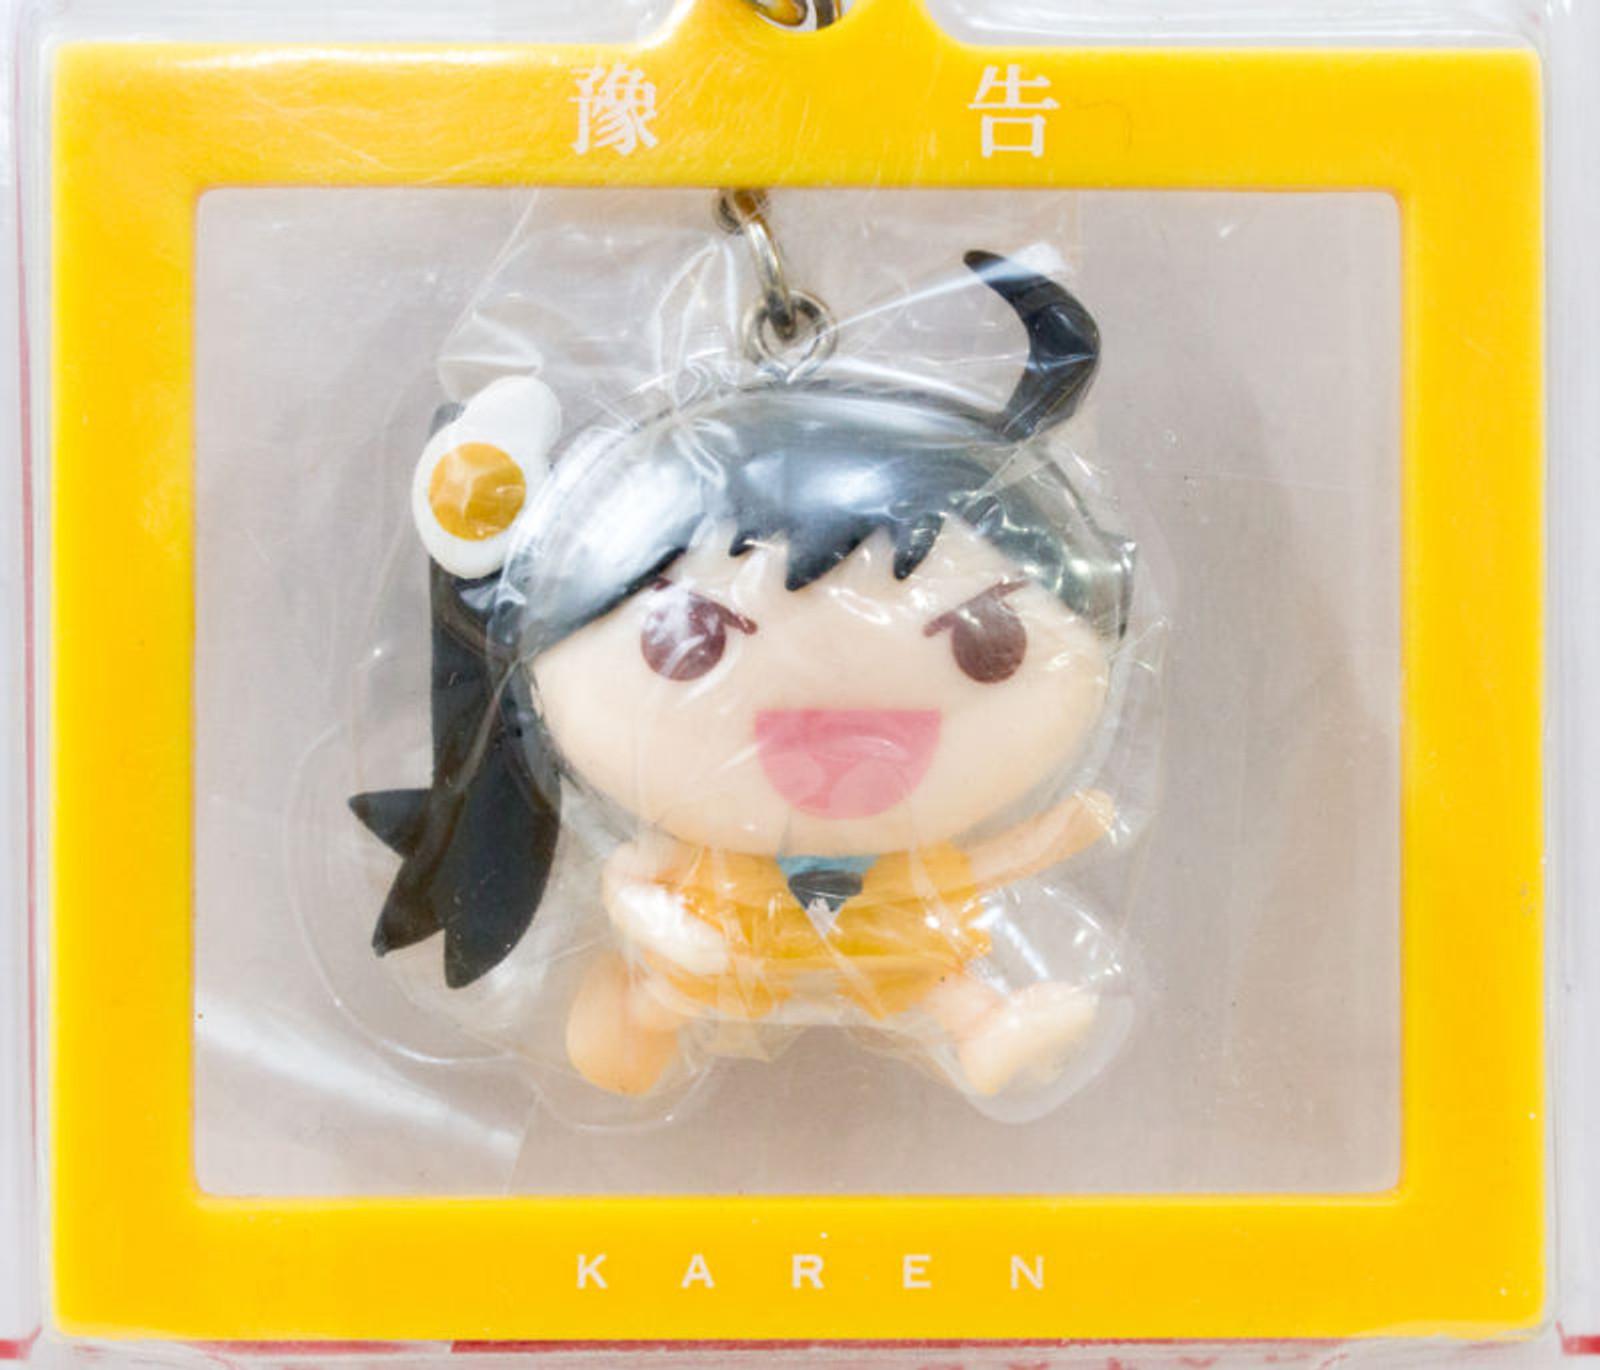 Bakemonogatari Karen Araragi Mascot Figure Strap Banpresto JAPAN ANIME MANGA